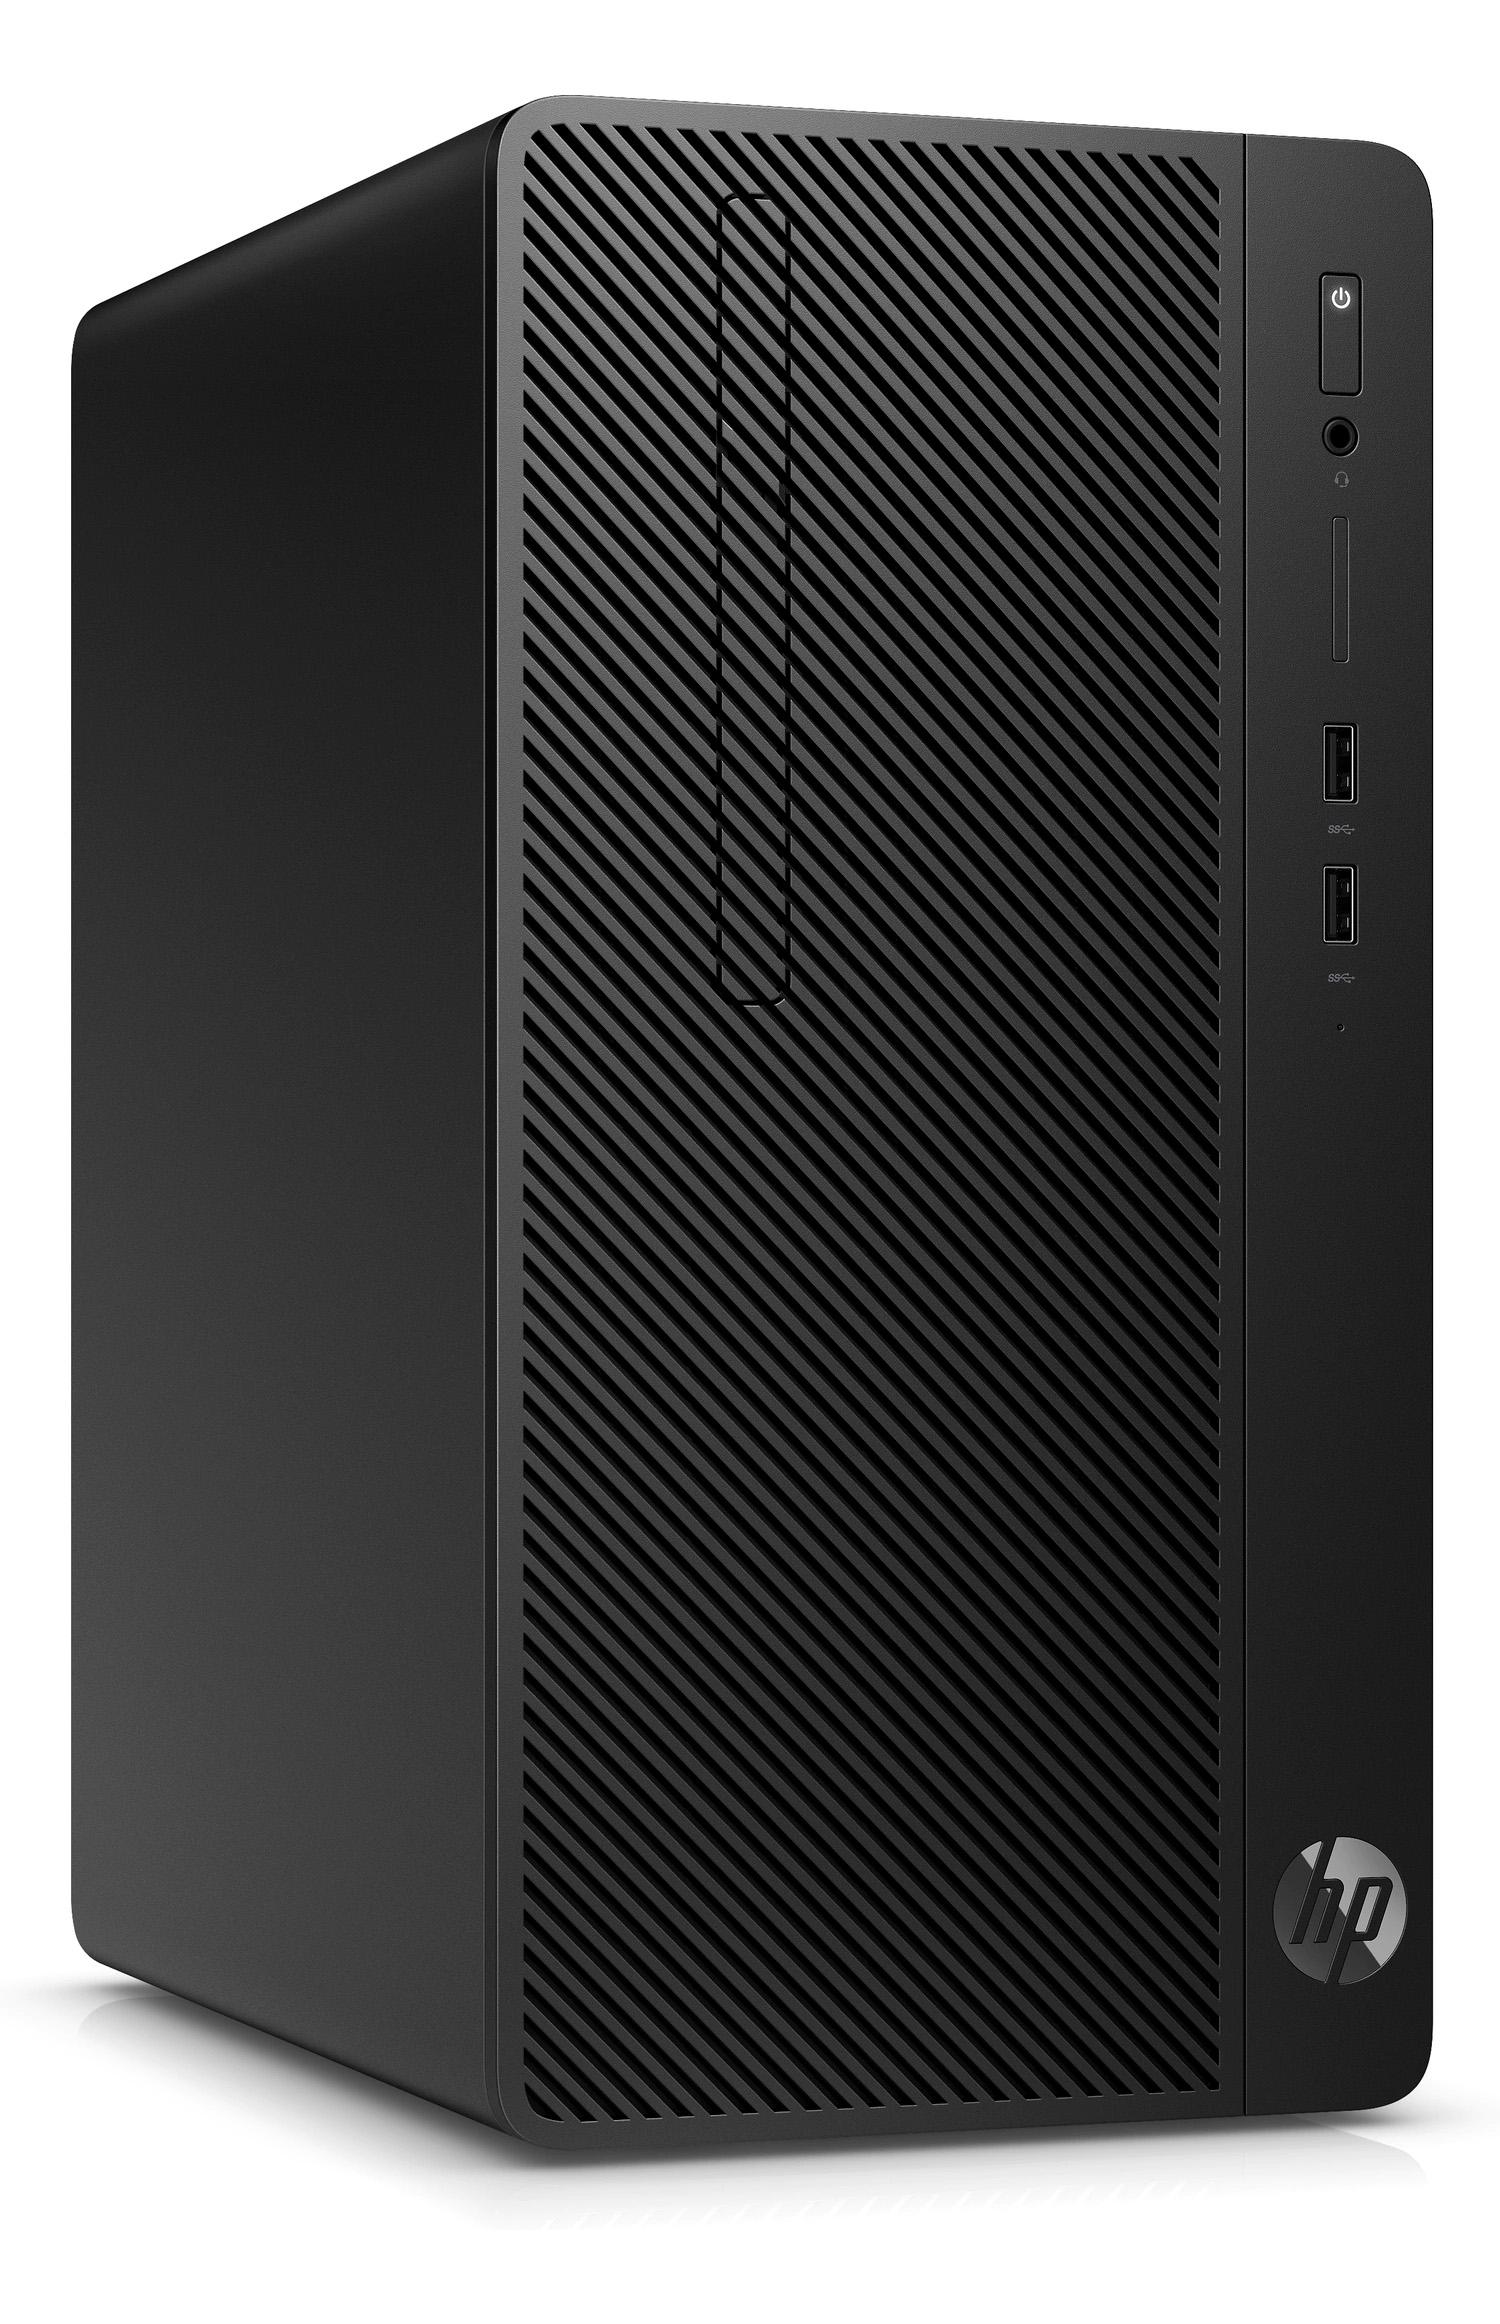 HP 280 Pro G5 MicroTower Desktop 3C773PA Intel Core i5-9400 8GB DDR4-2666 1TB Win 10 Pro HP 18.5inch Monitor